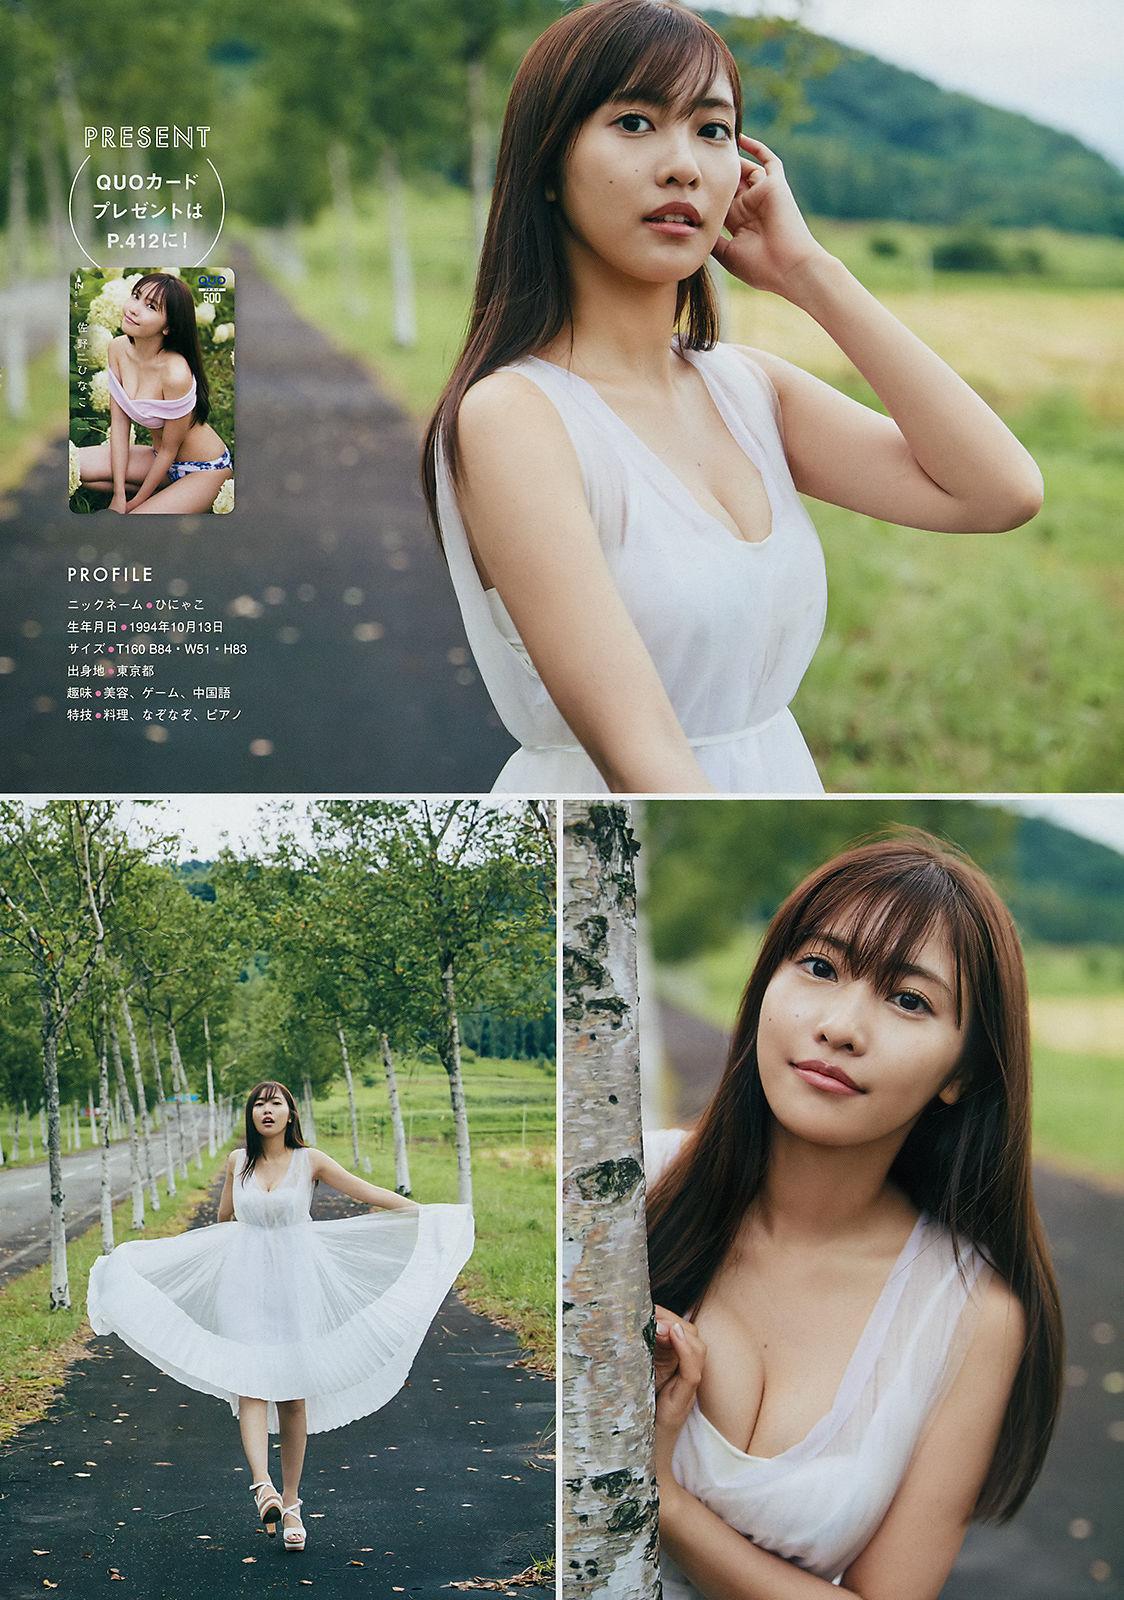 VOL.666 [Young Magazine]日本嫩模:佐野雏子(佐野ひなこ)超高清写真套图(12P)